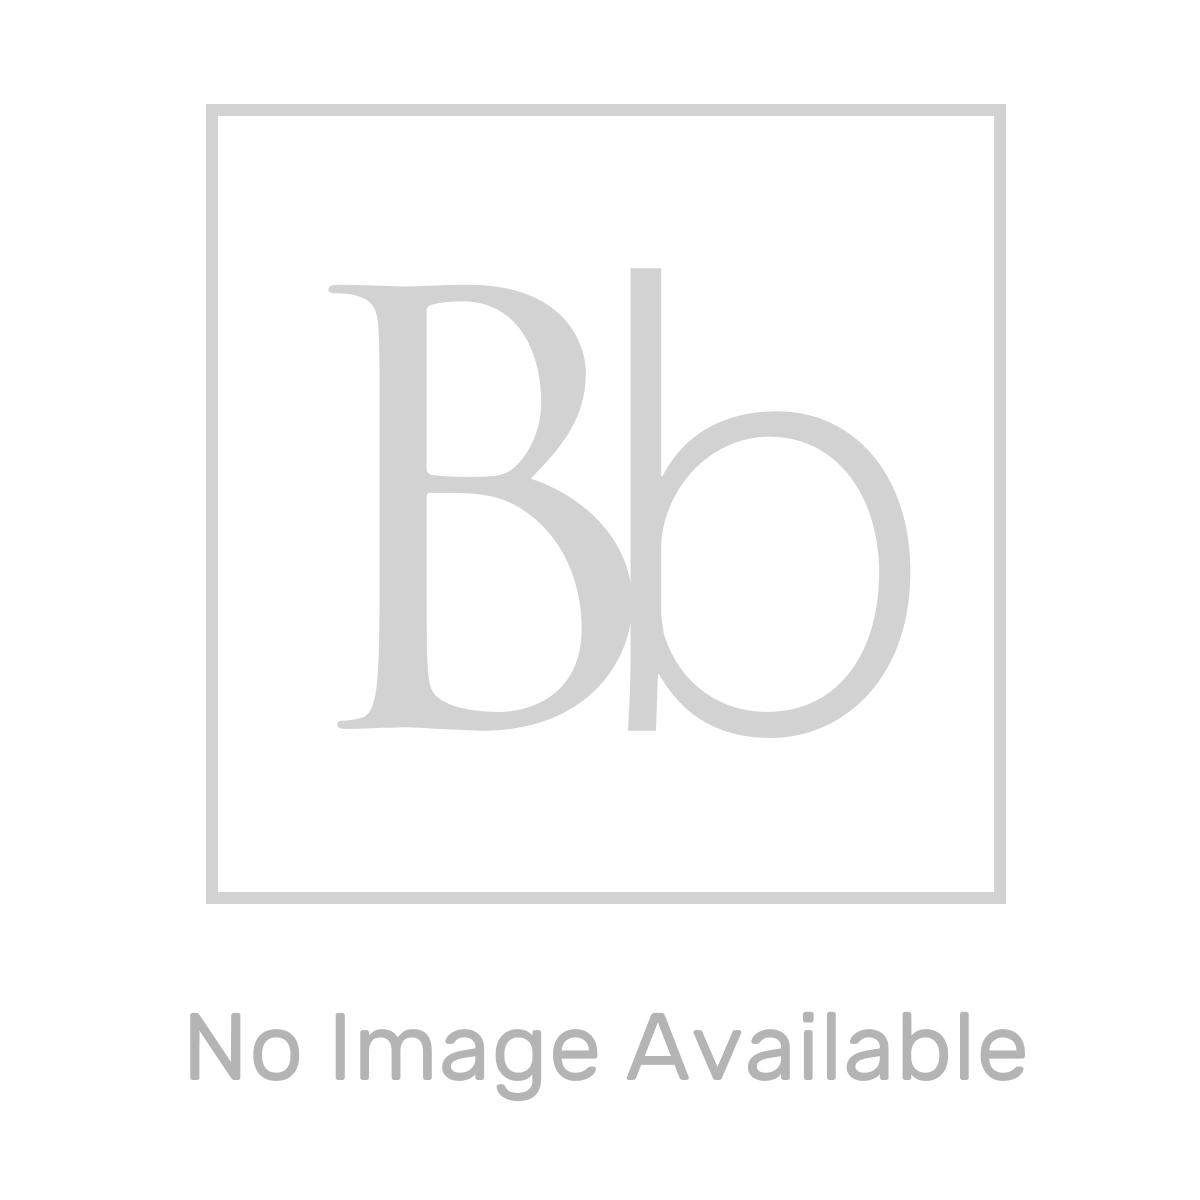 Burlington Chrome Soap Dish and Holder